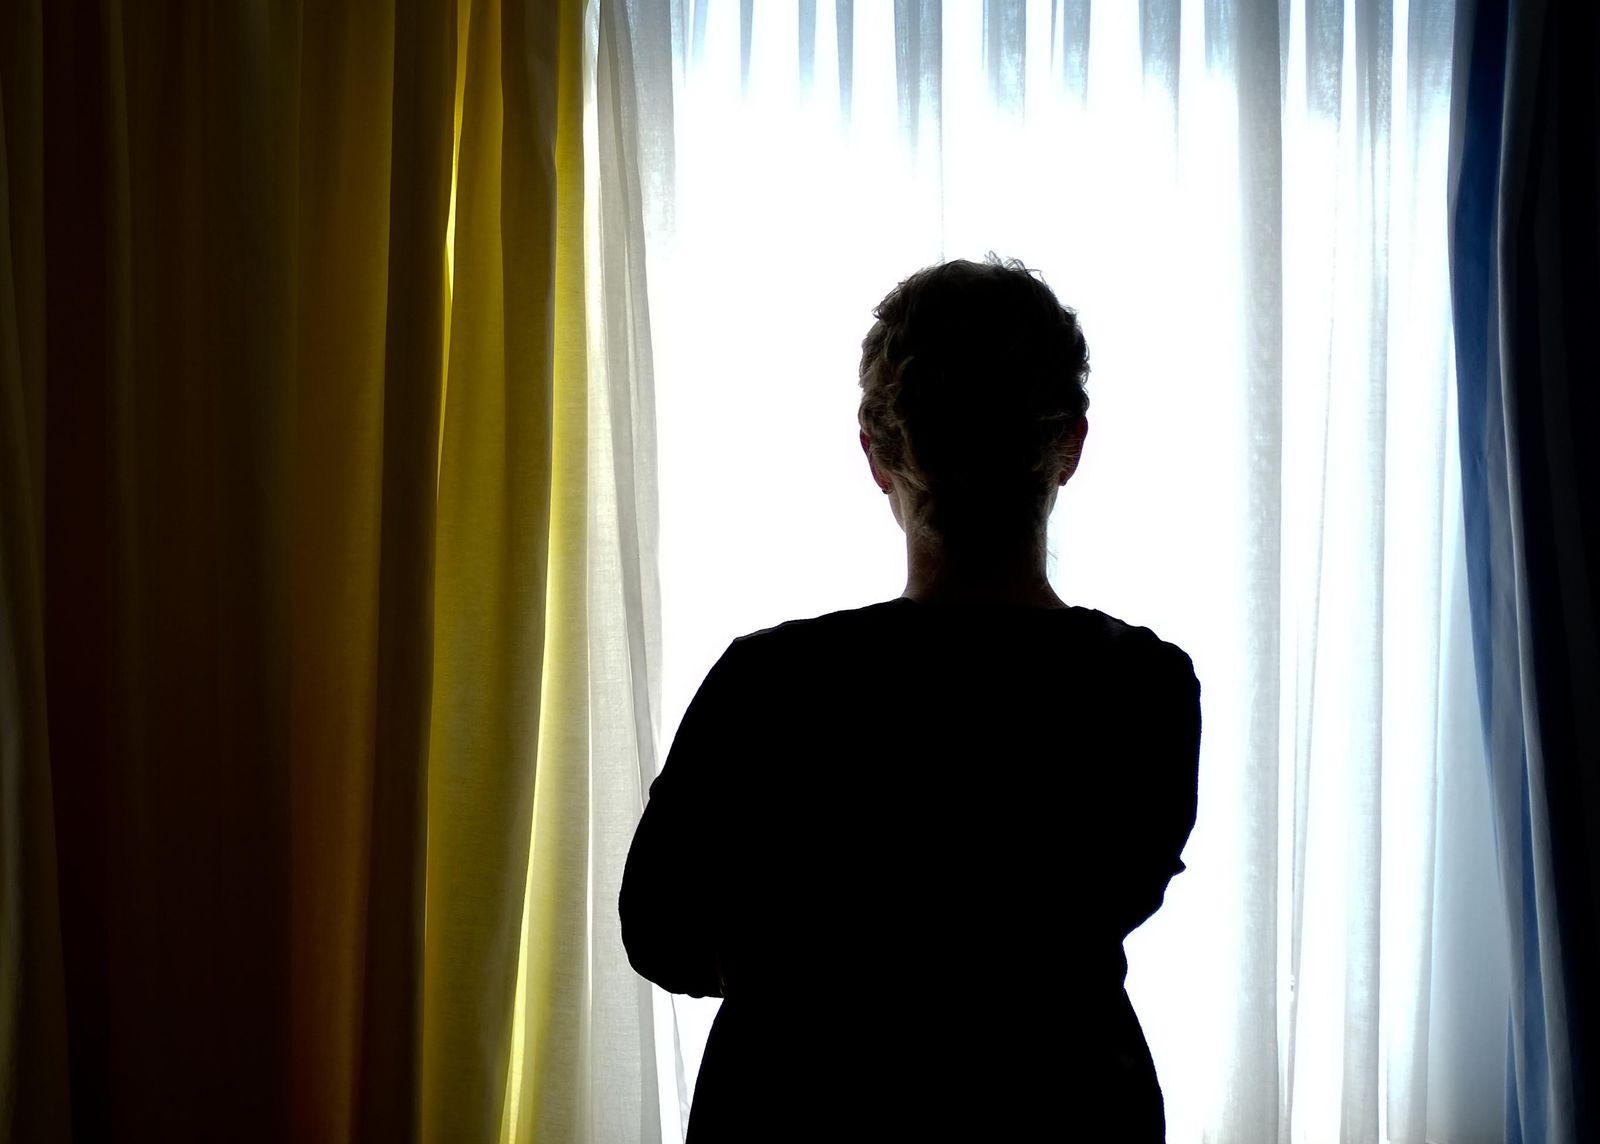 Frau am Fenster im Frauenhaus